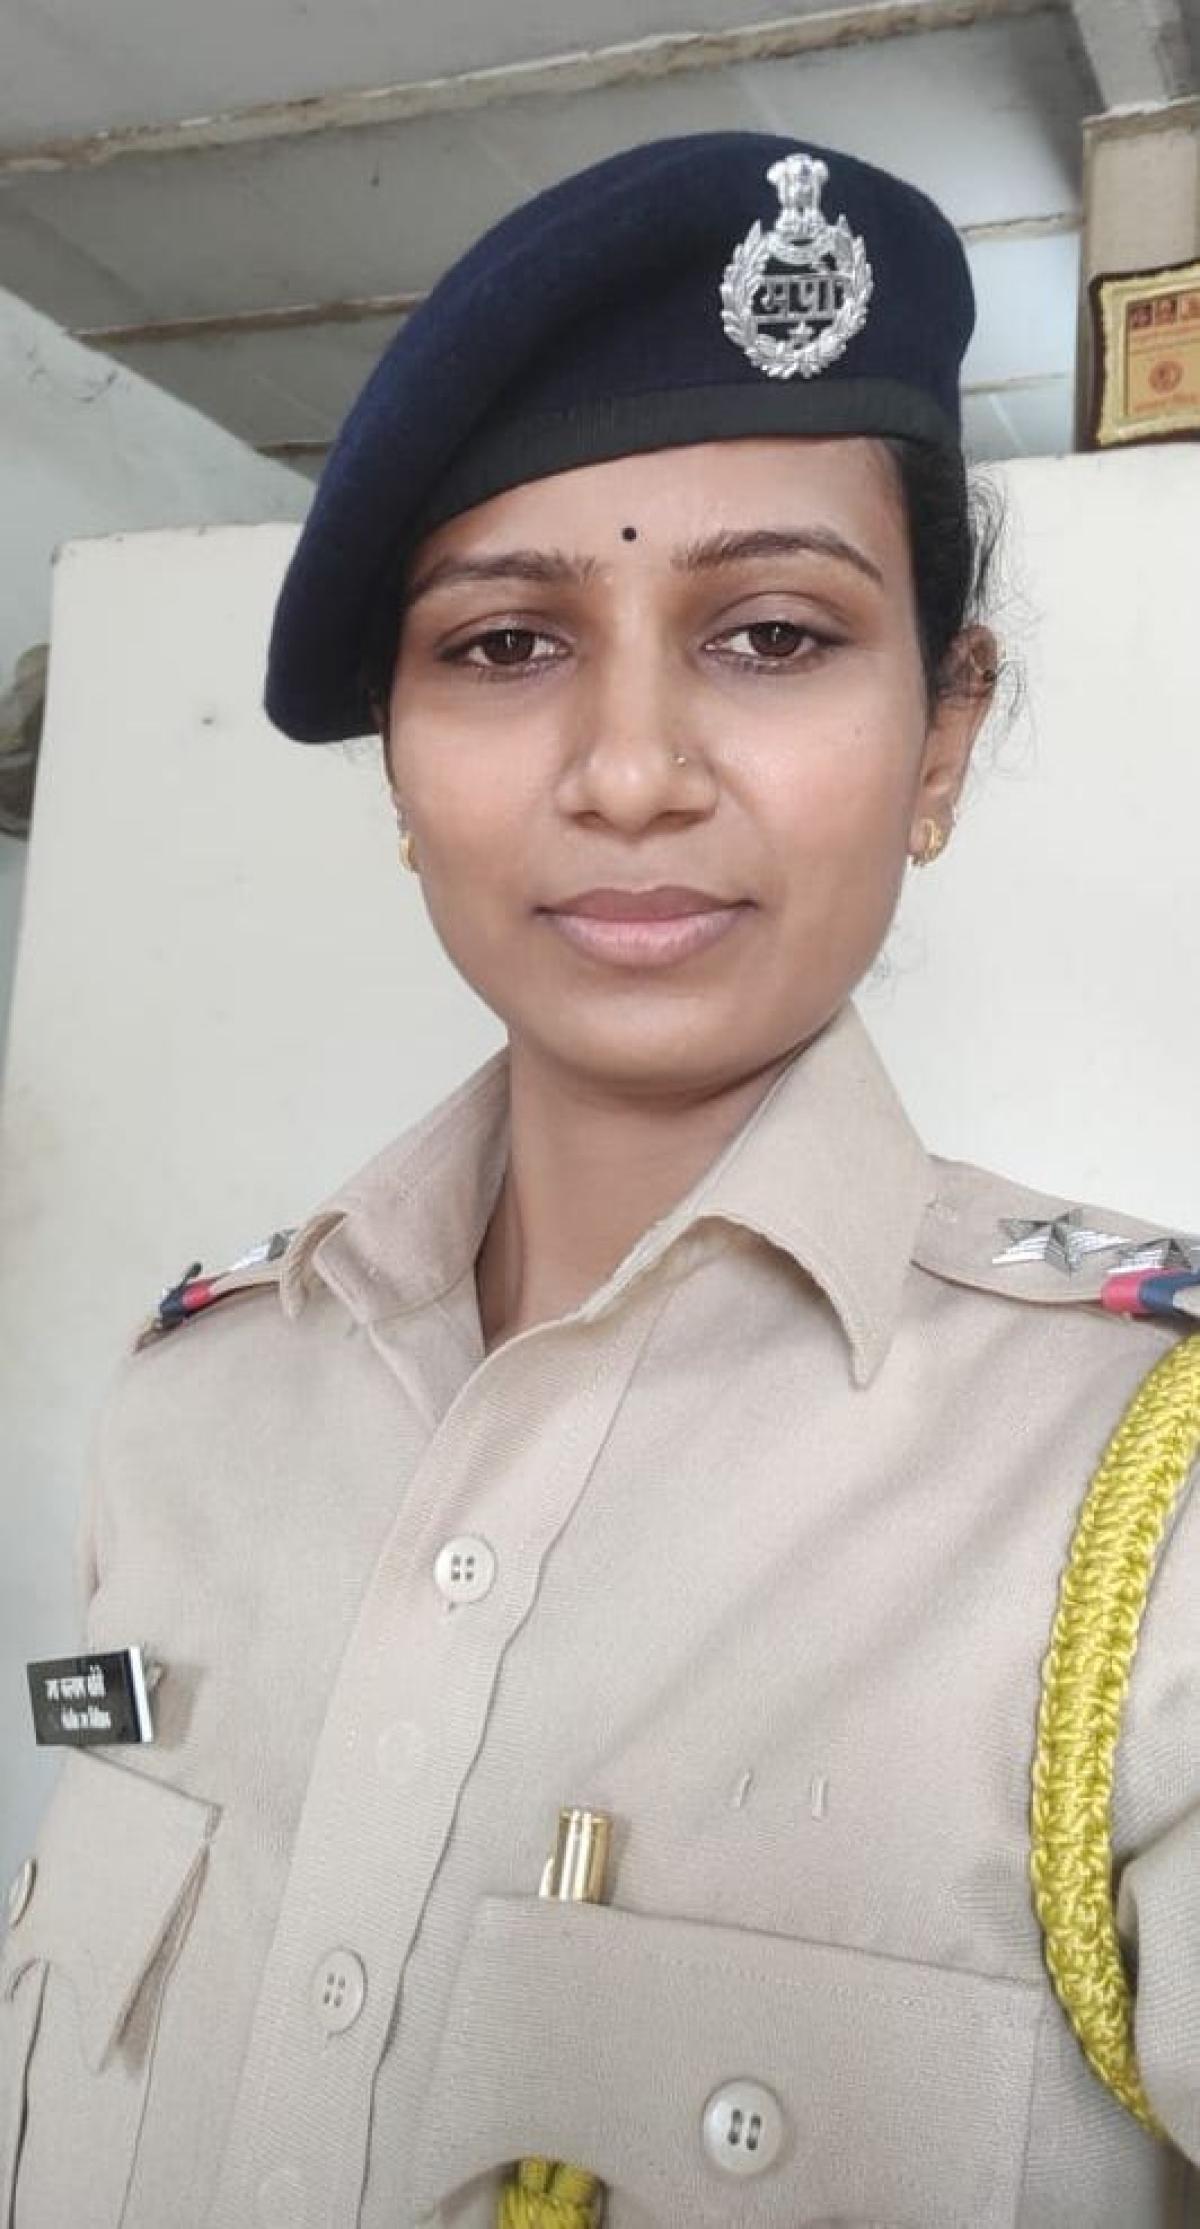 Sub Inspector (PSI) & Missing Persons Unit Officer, Usha Khose